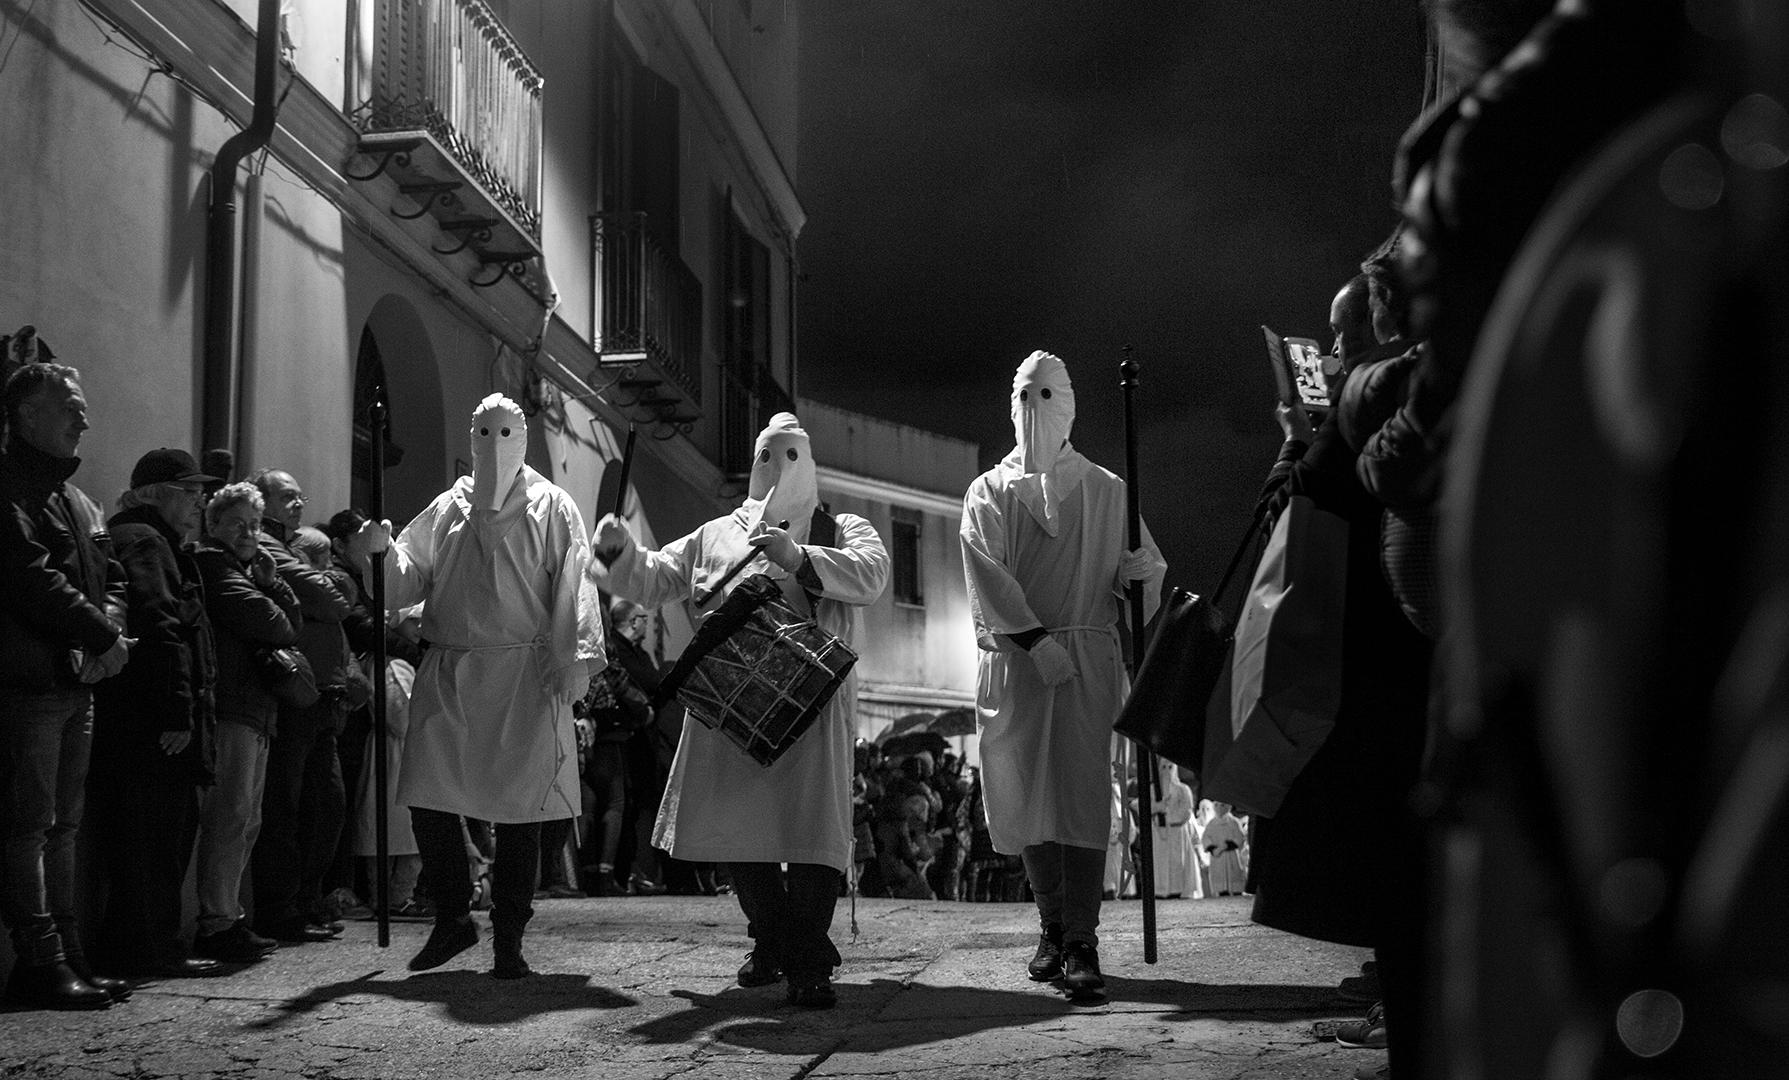 Settimana santa, iglesias, Sardegna, 2018